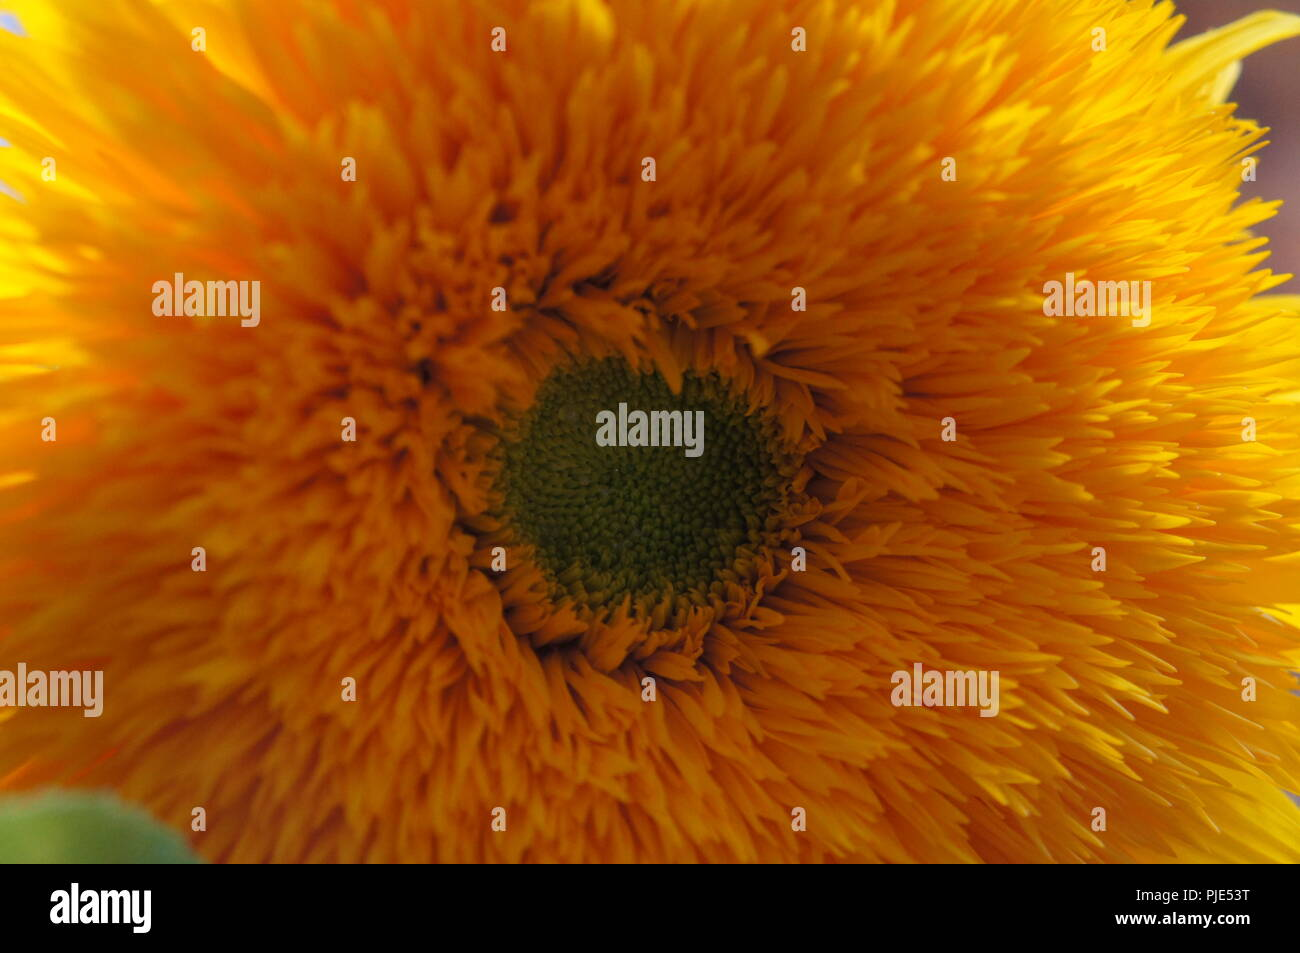 Sunflower teddy bear Helianthus annuus orange, Tournesol teddy bear Helianthus annuus orange, Osito de peluche Helianthus annuus naranja, Sonnenblumen - Stock Image